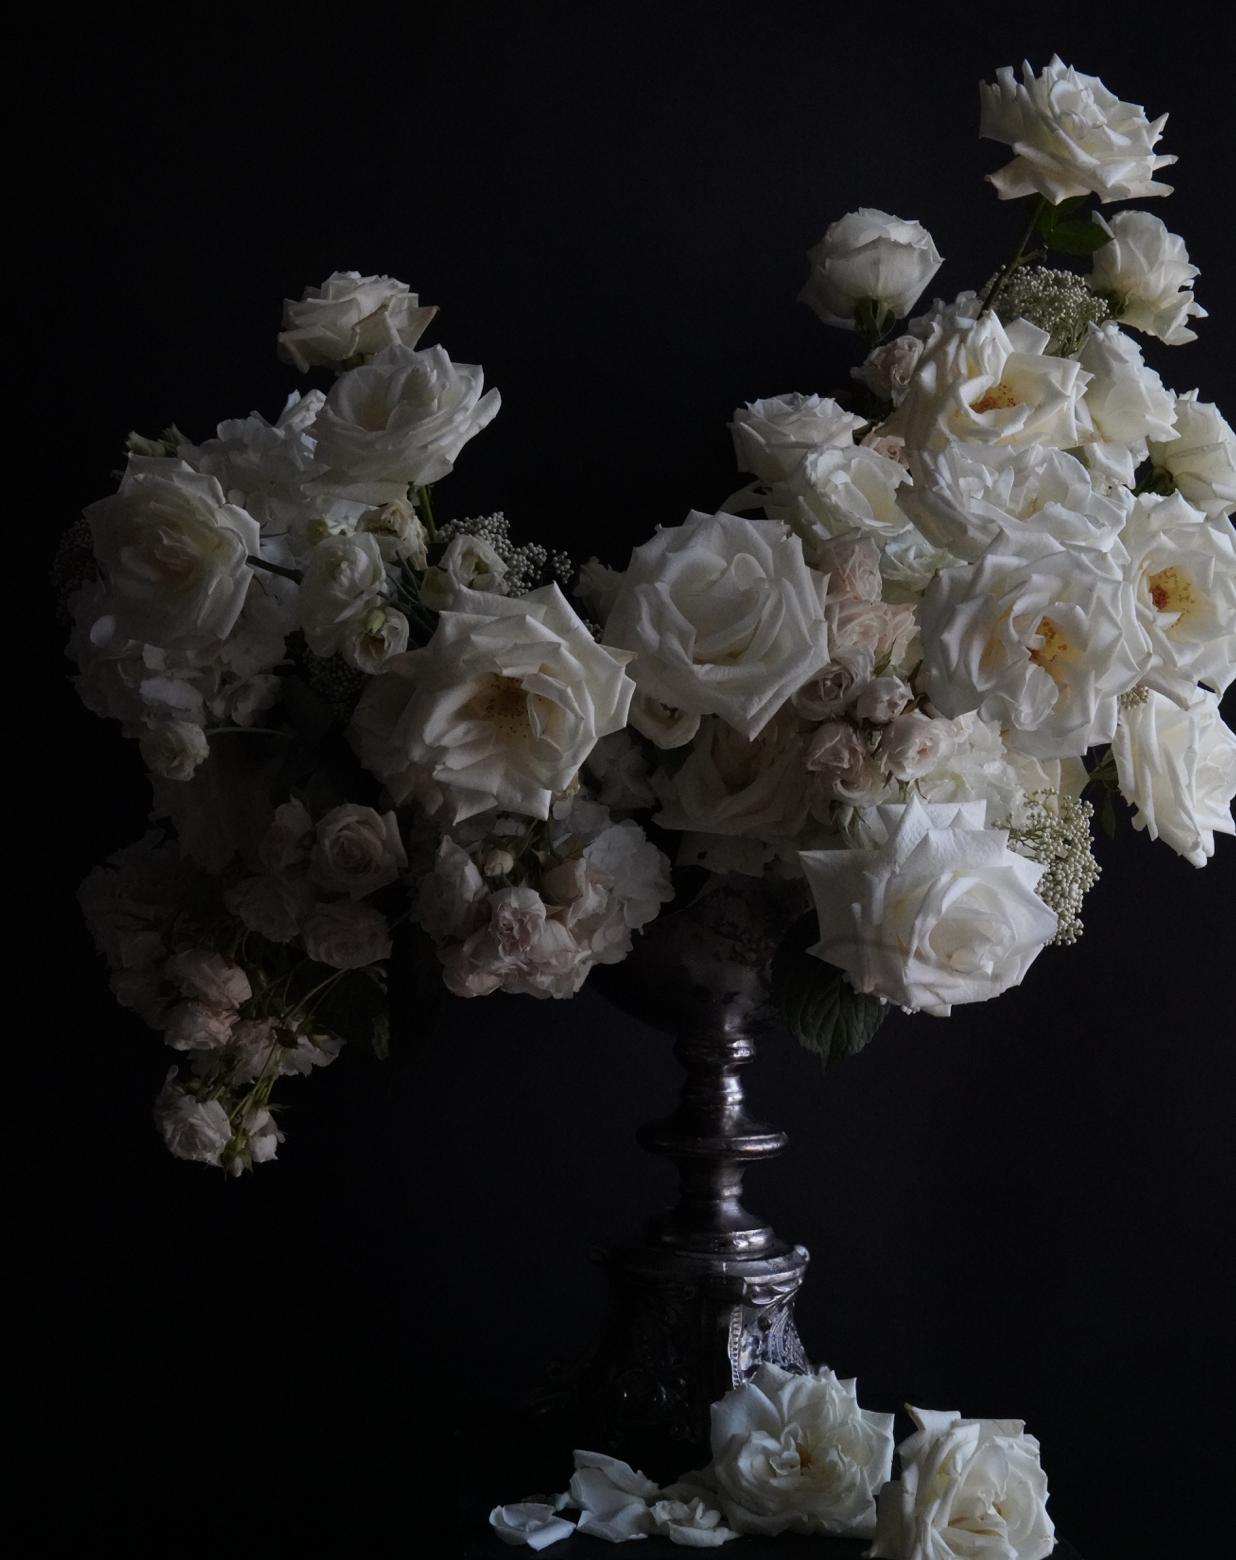 White-Hydrangea-Roses-Arrangement-Houston-Wedding-Stylist-Flowers.png